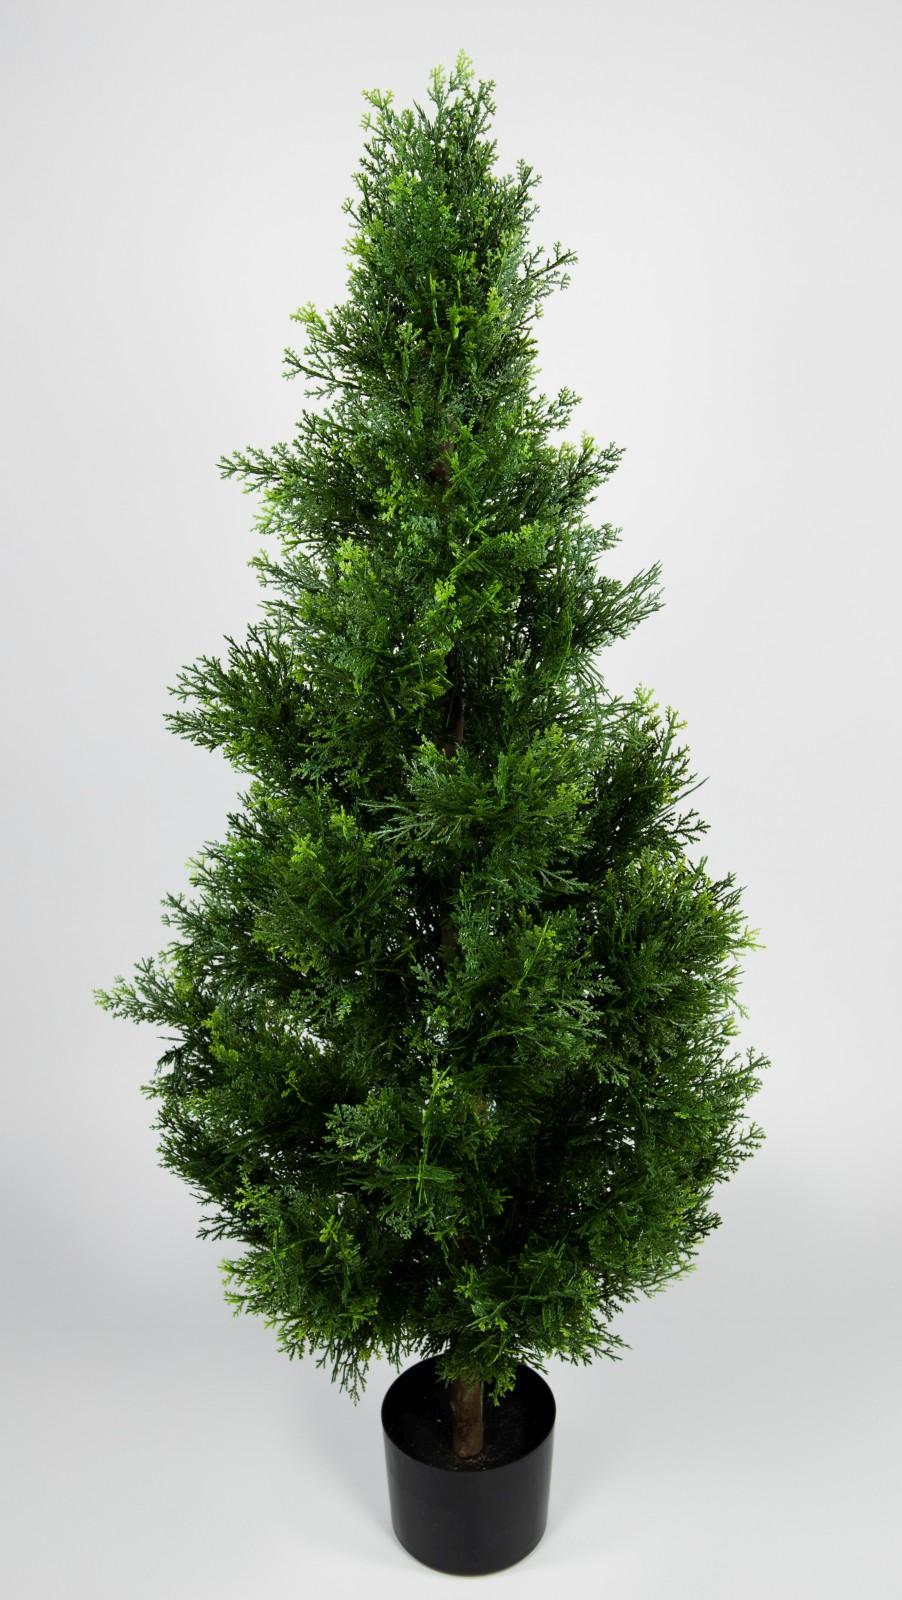 zeder konifere natura 120cm gr n la kunstpflanzen k nstliche pflanzen thuja ebay. Black Bedroom Furniture Sets. Home Design Ideas